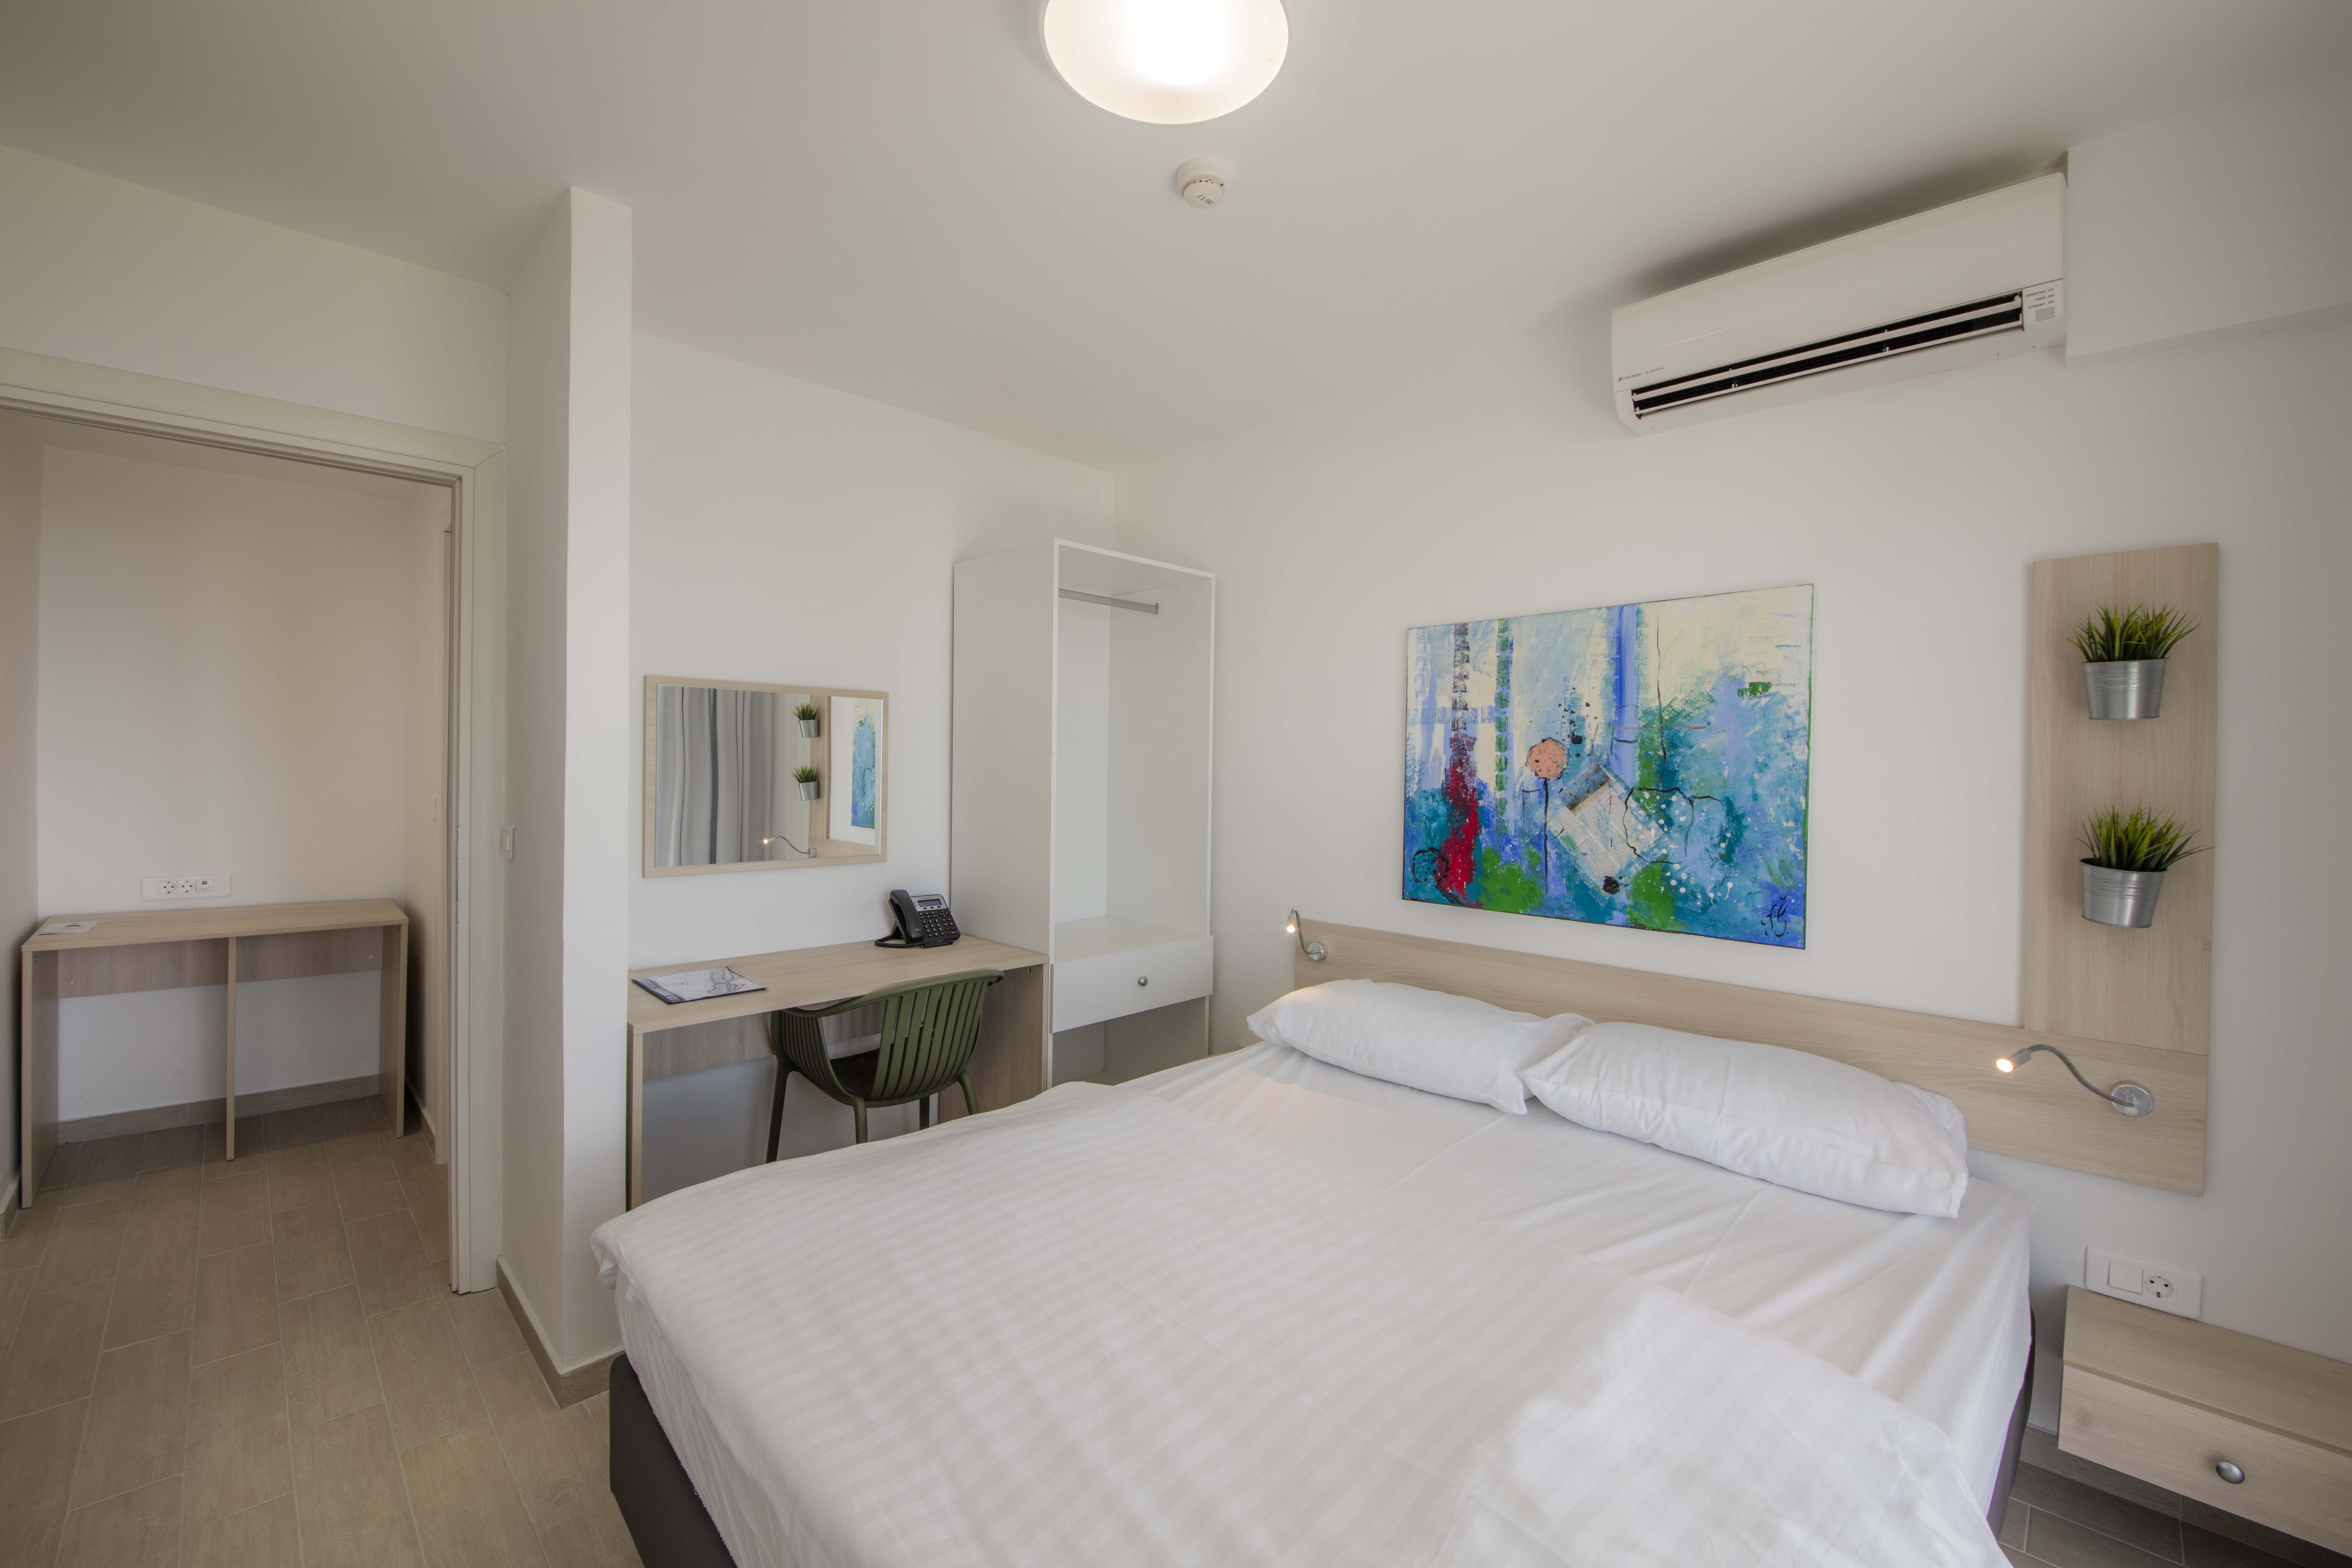 Hotel_and_dependance_Bellevue,_Orebić_16